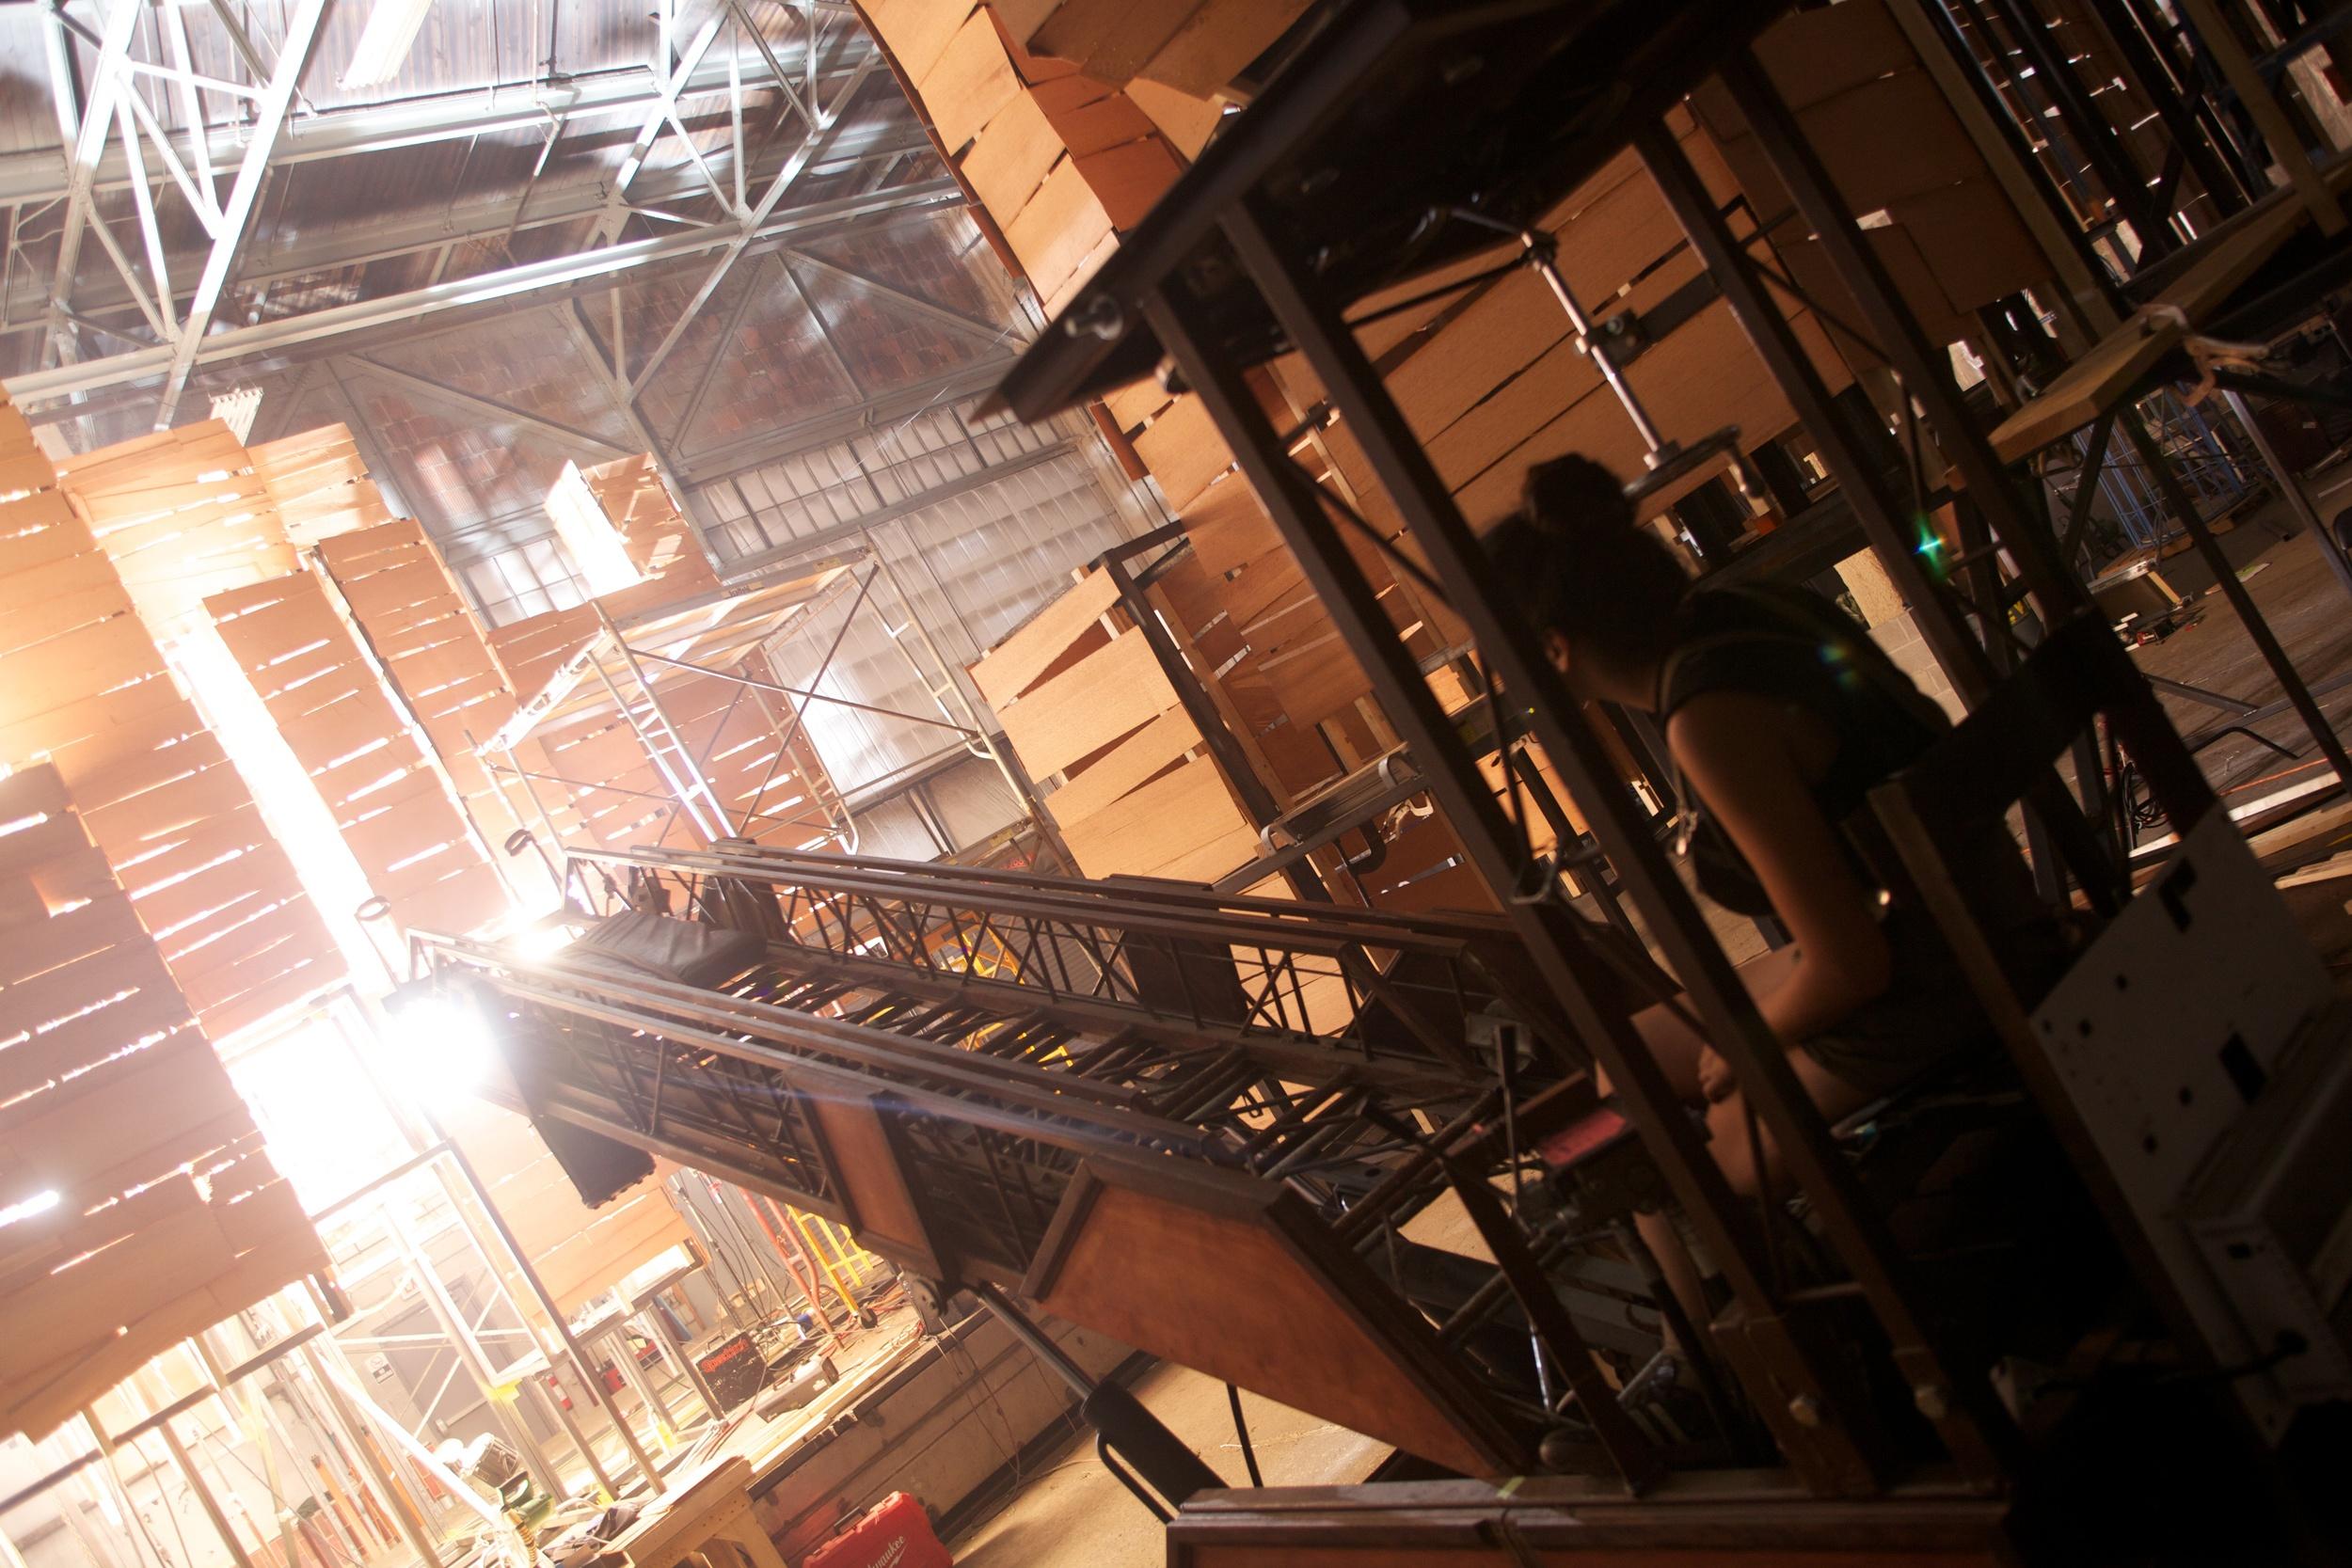 082914 House ArmatureScaffolding Formal Jackie 712.jpg